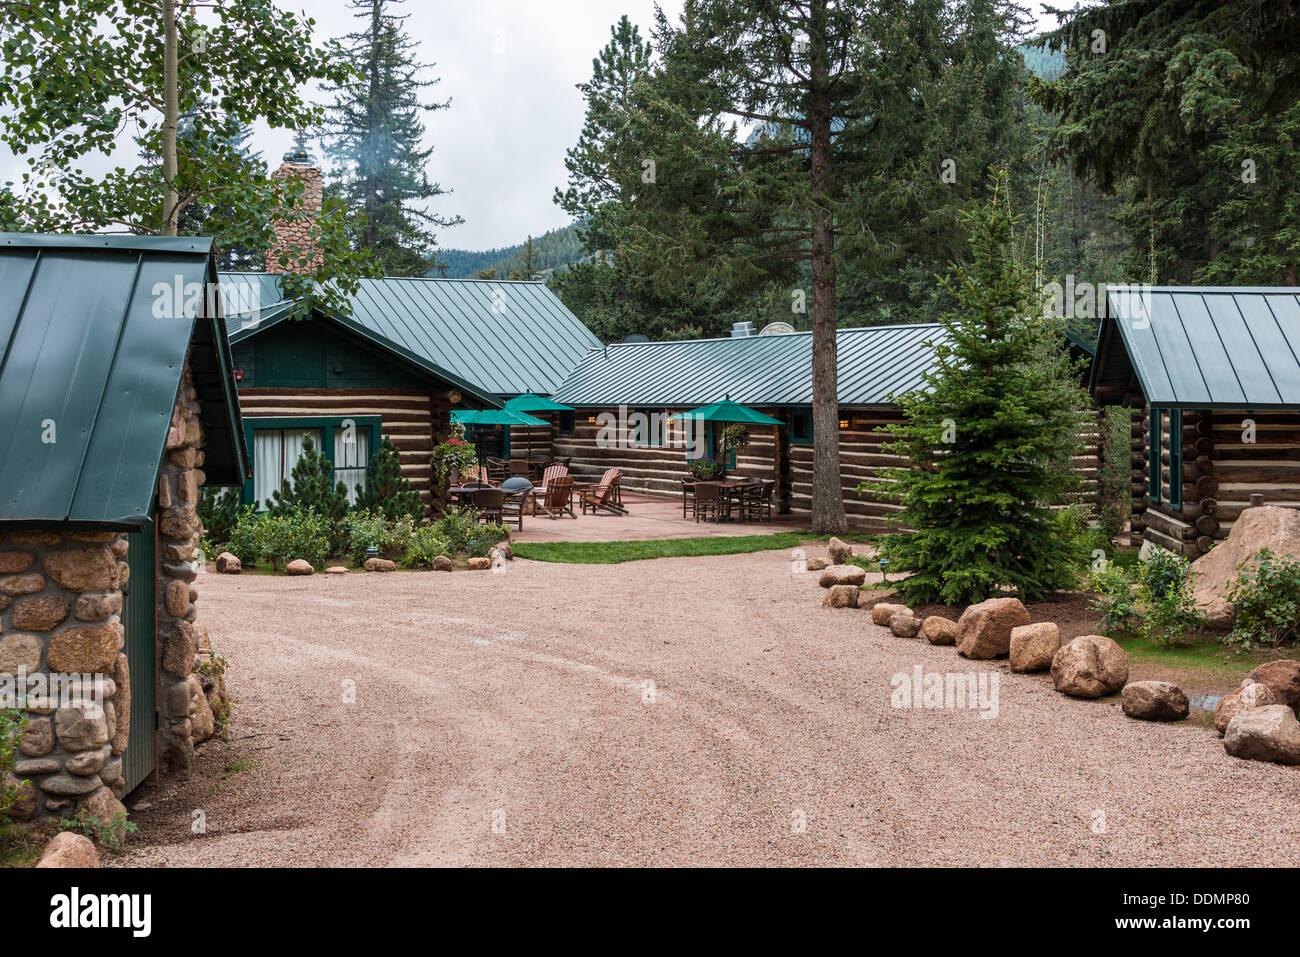 Log Cabins Rocky Mountains Stock Photos & Log Cabins Rocky